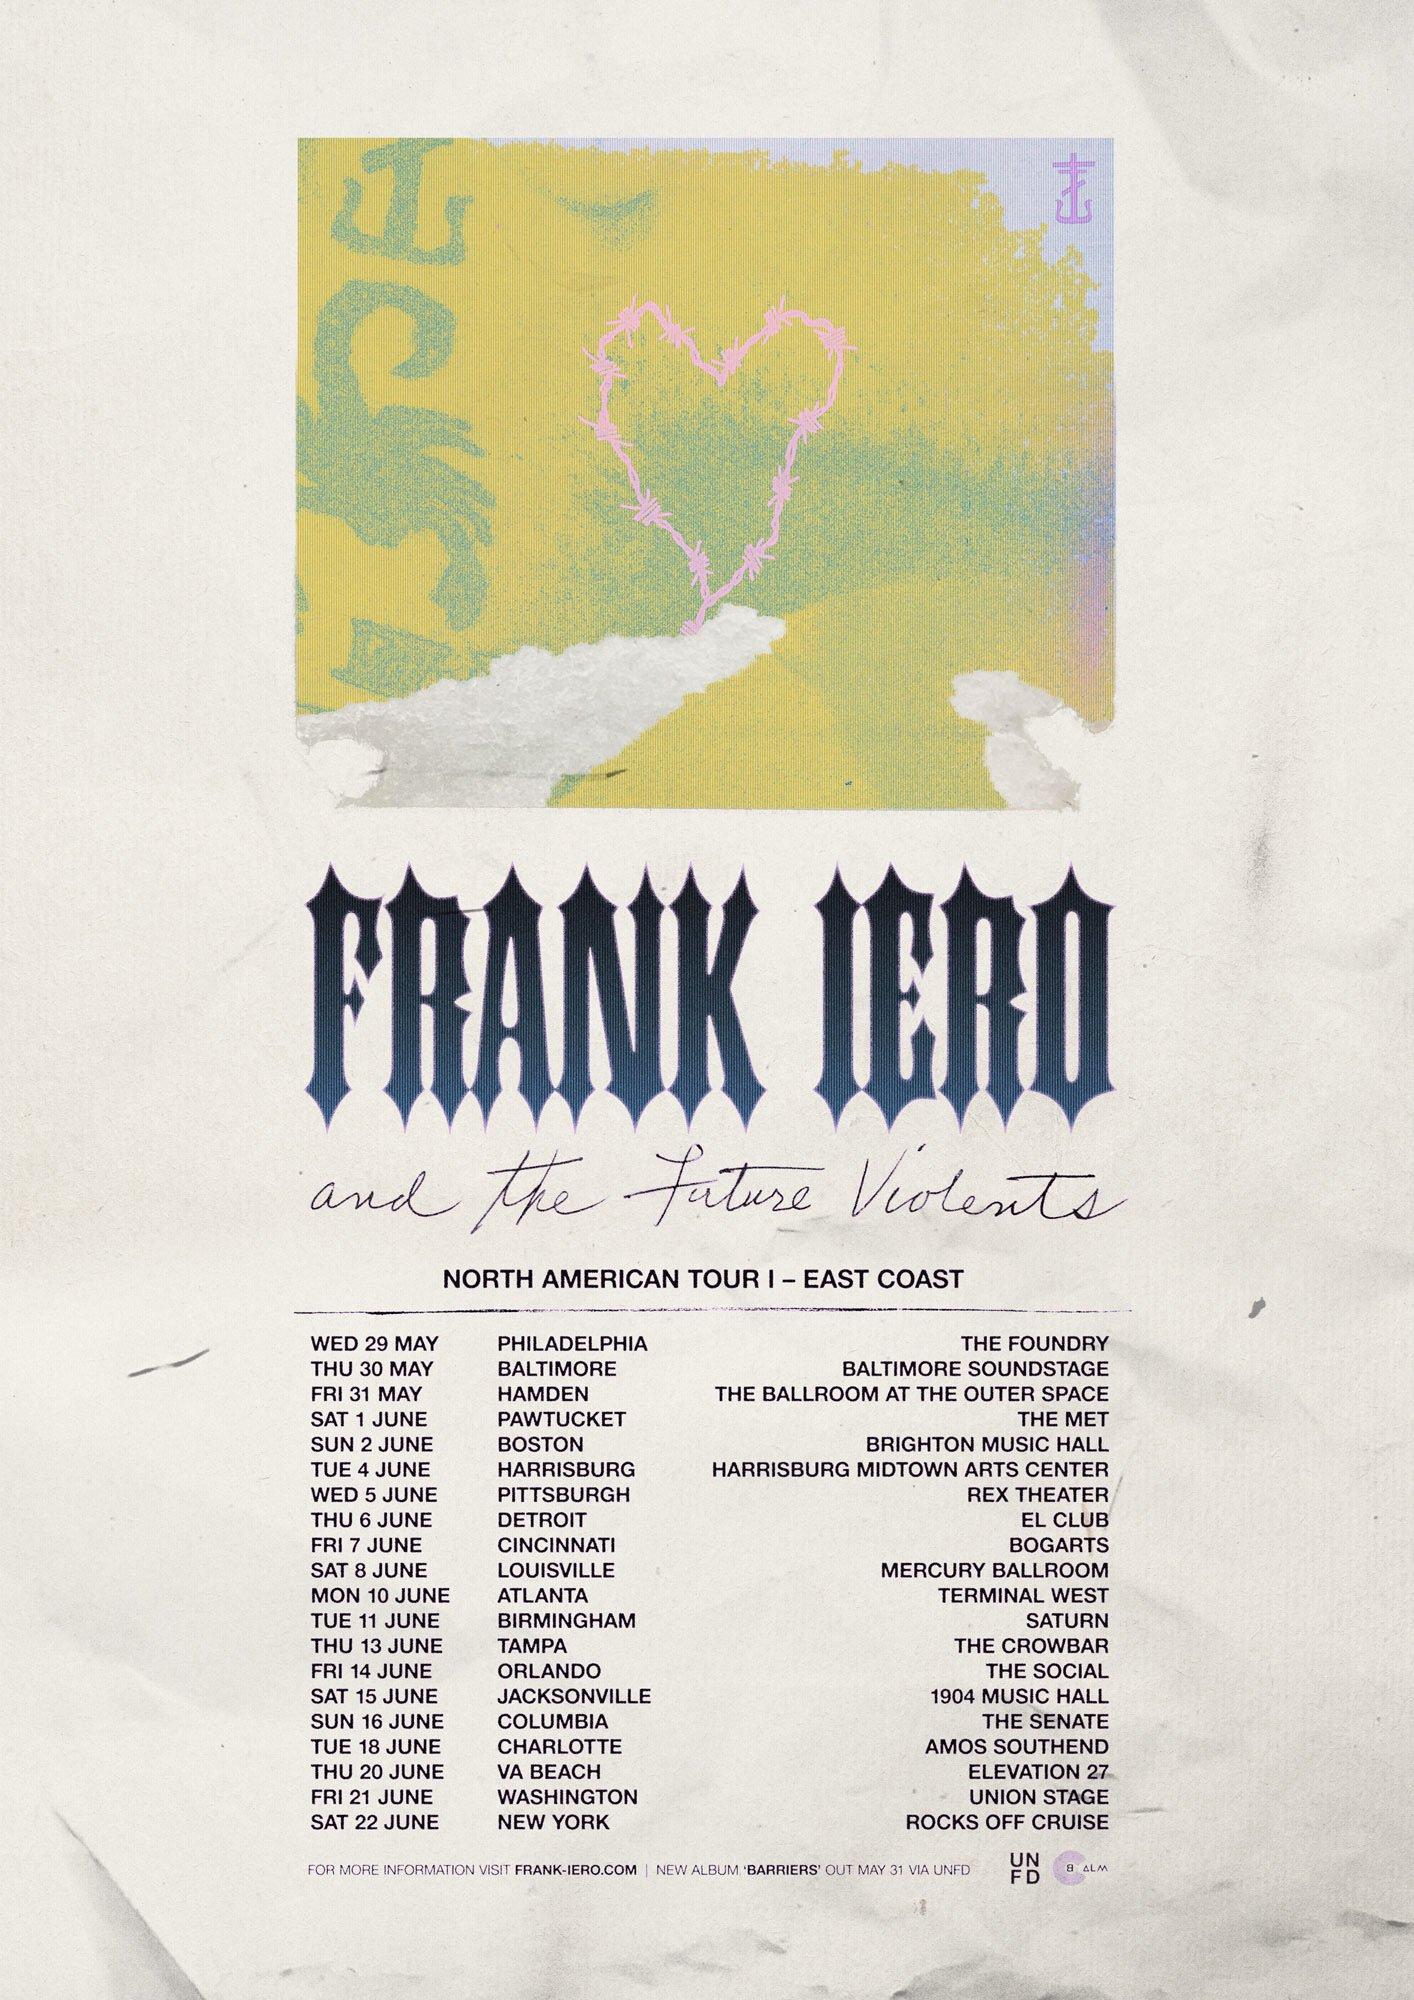 Frank Iero and The Future Violents East Coast Headline Shows on Sale Now! https://t.co/TU4zbusnm2 https://t.co/n3BjK46Tz2